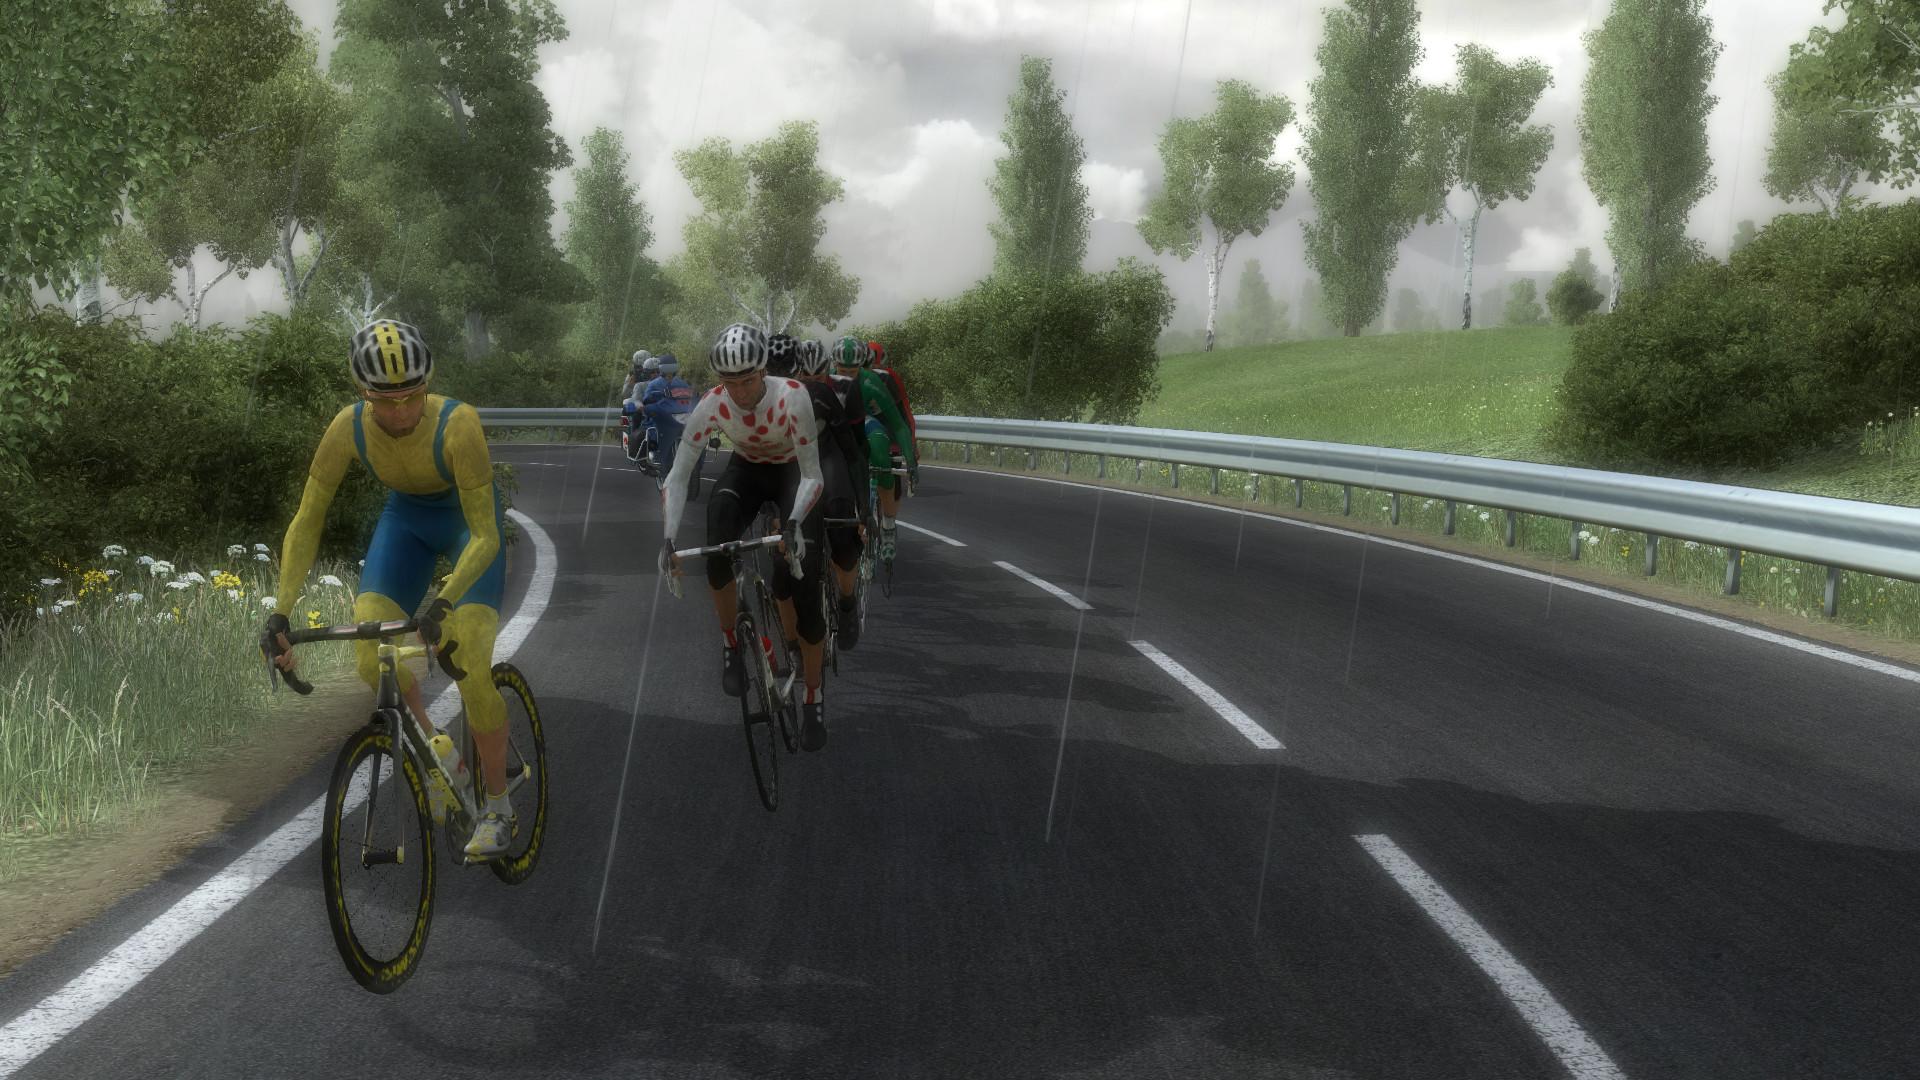 pcmdaily.com/images/mg/2019/Races/PTHC/Pologne/E5/16.jpg